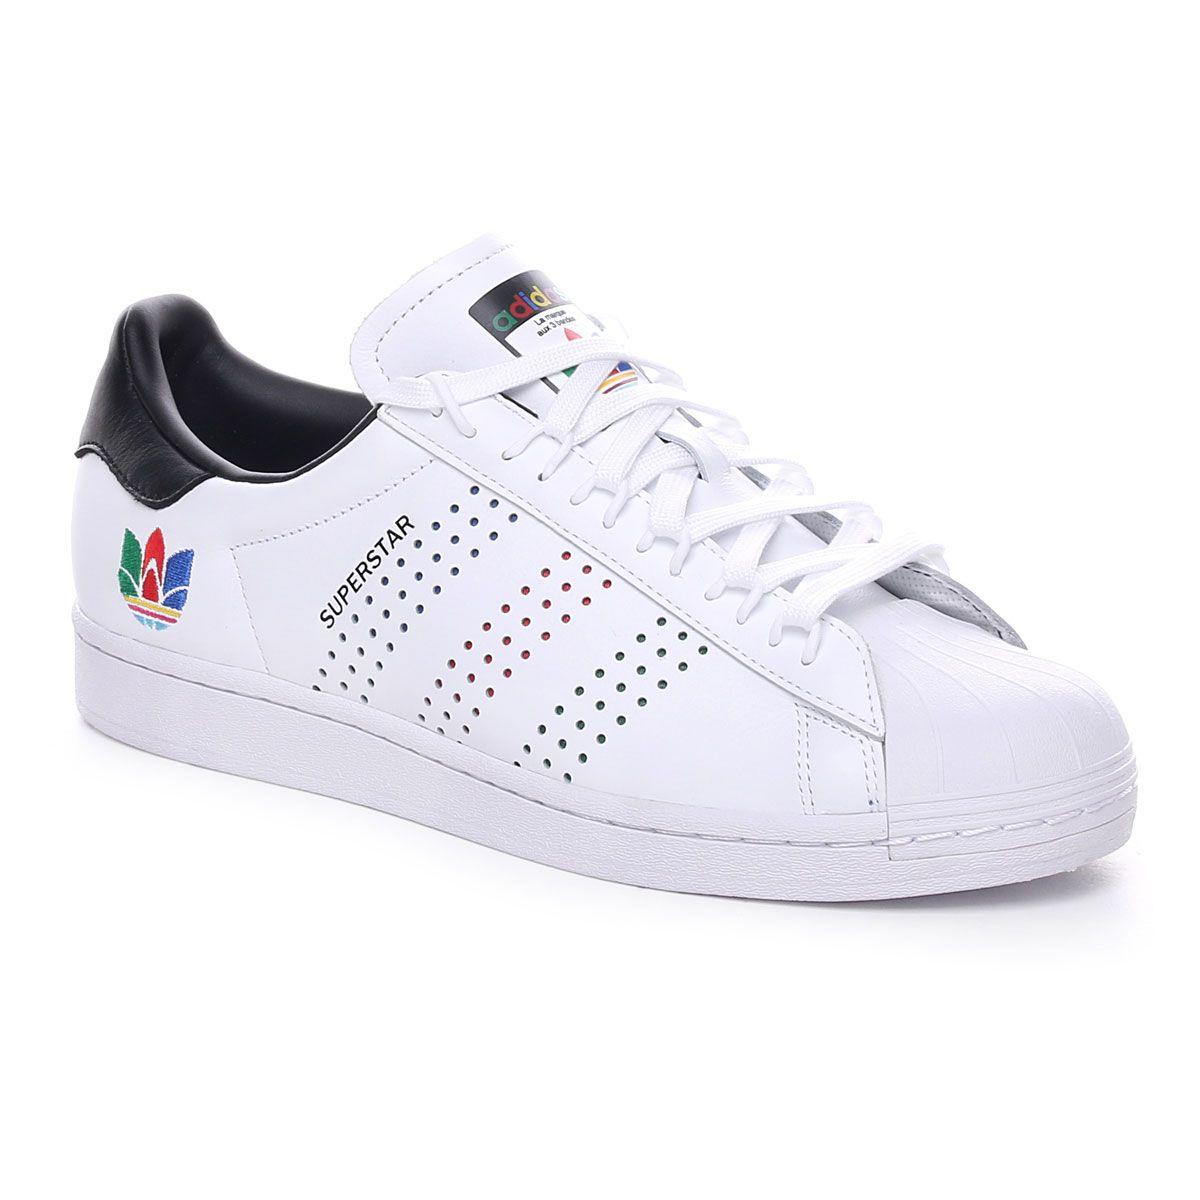 Adidas Superstar Logo 3D Uomo Bianco Nero